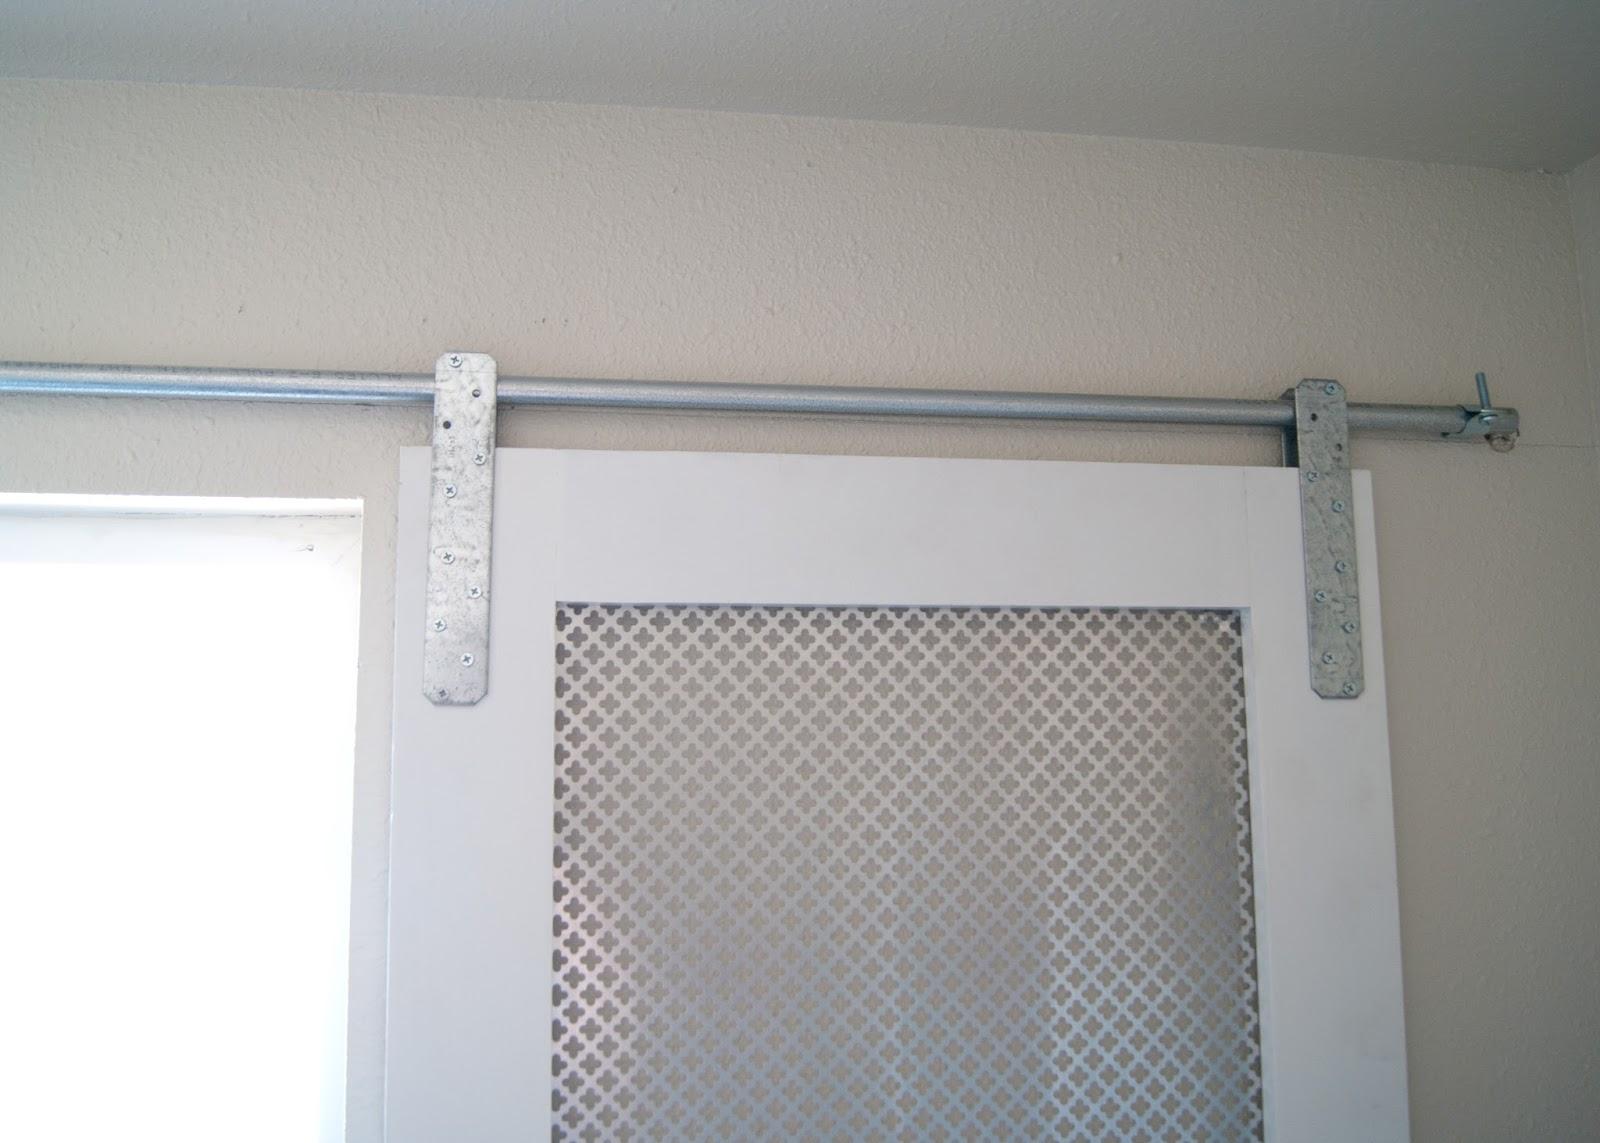 Diy Barn Door Window Cover For The Bathroom Hanging Cov